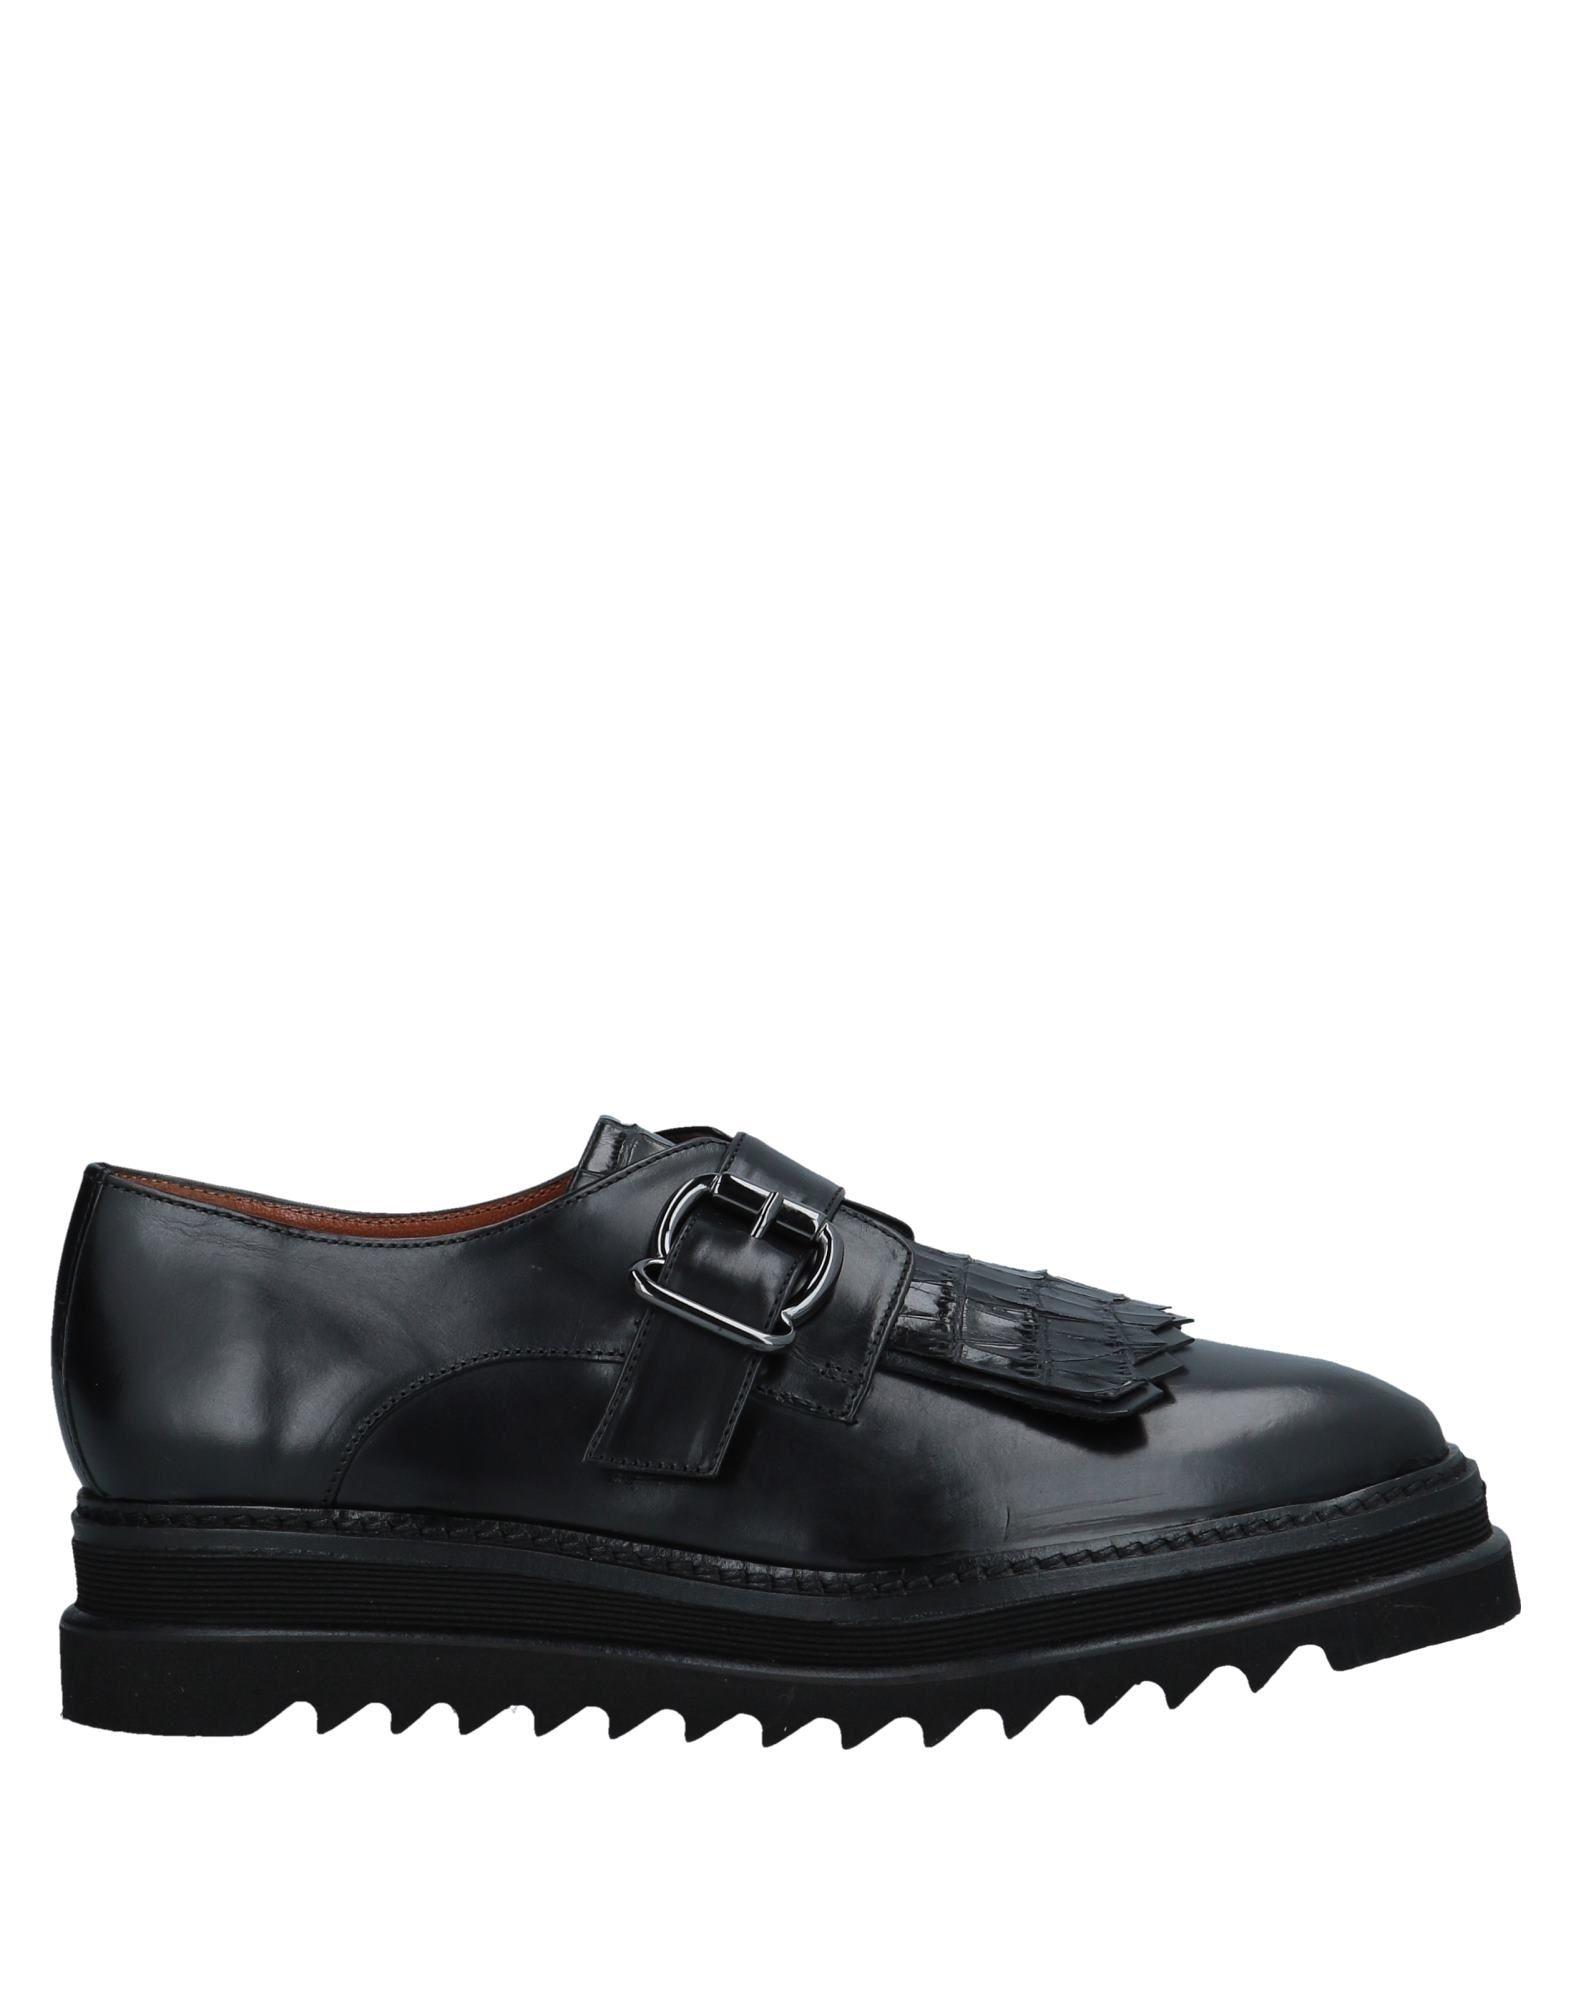 Stilvolle billige Schuhe Pons  Quintana Mokassins Damen  Pons 11556028JW 4b559d